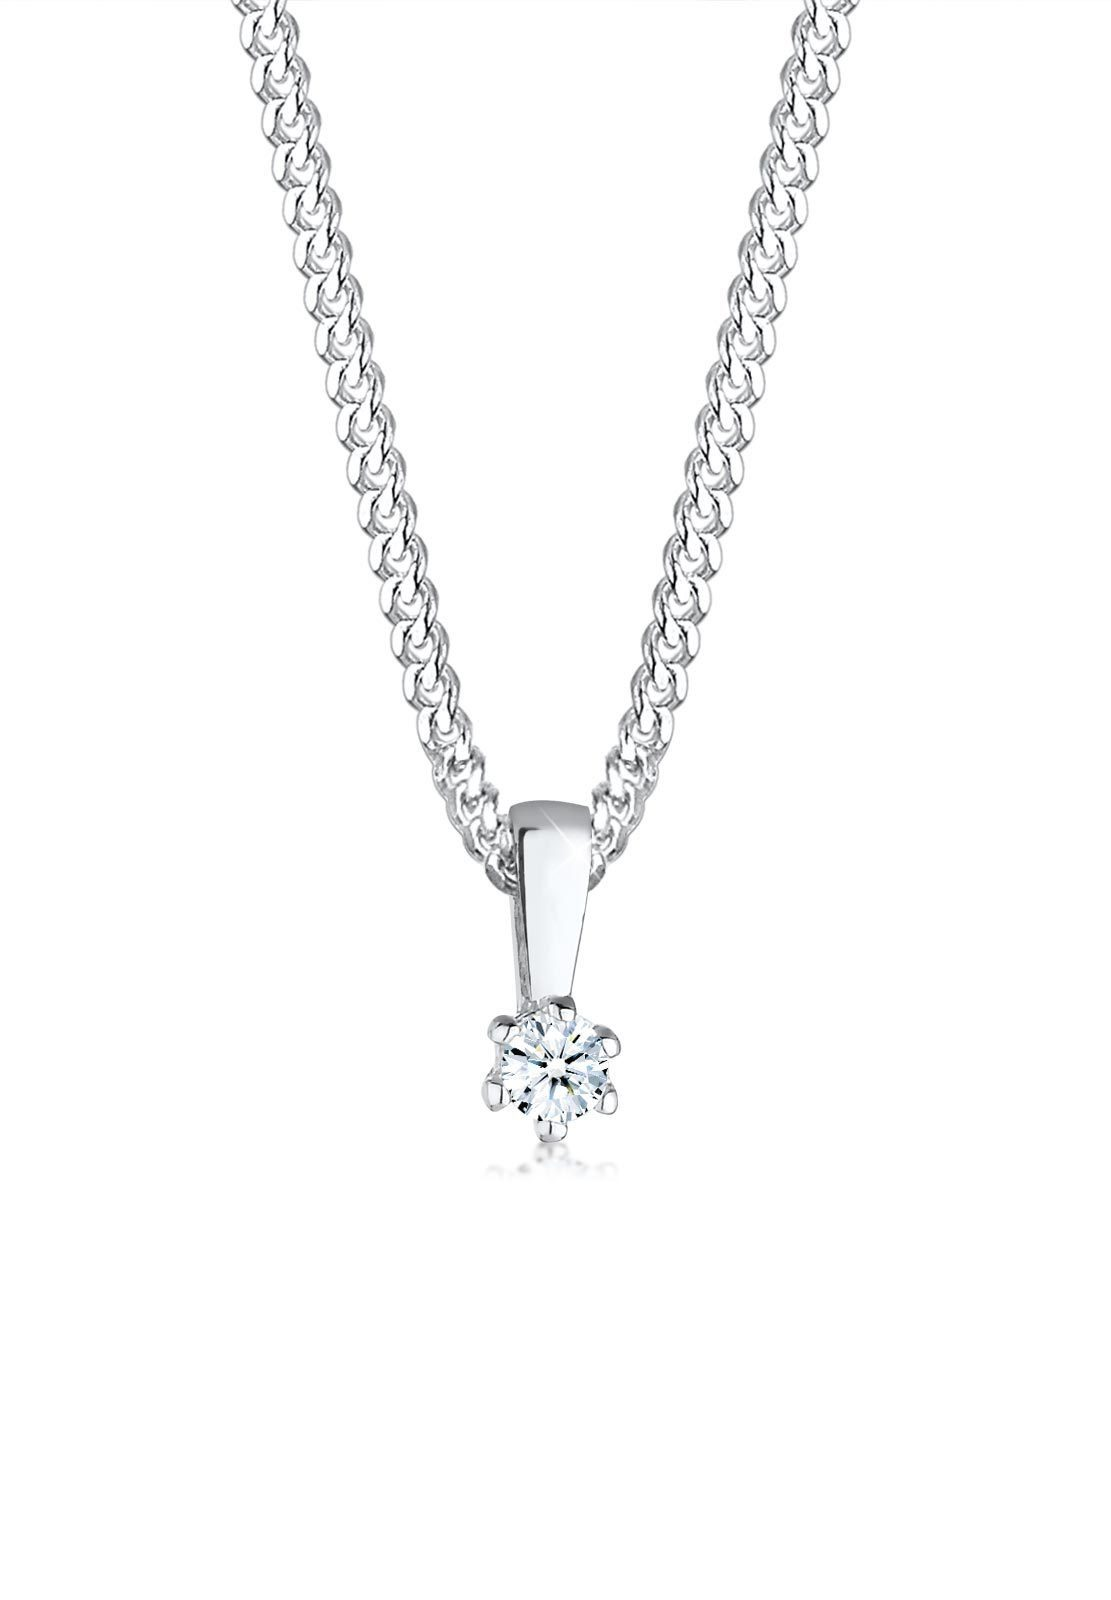 Diamore Halskette »Kreis Diamant Geschenkidee 925 Sterling Silber«